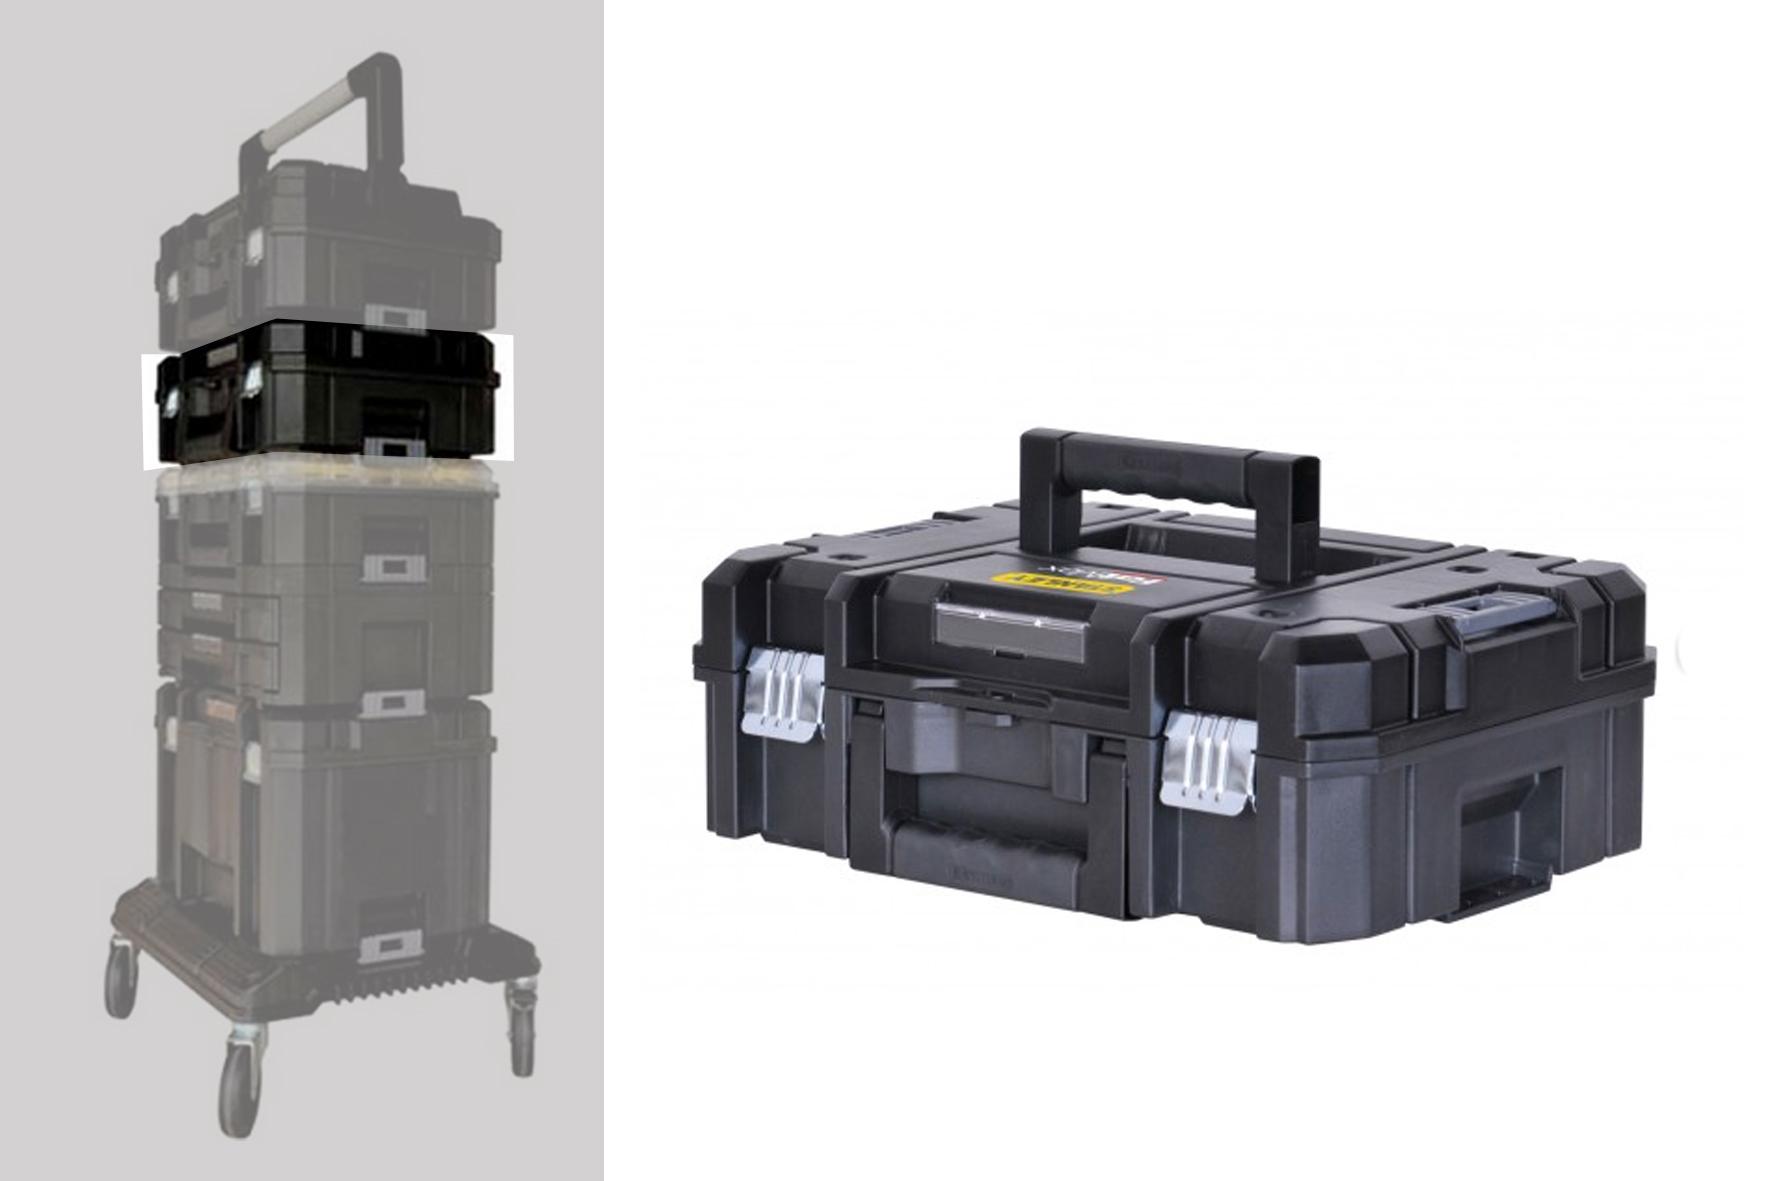 bo te 39 39 outils tstak ii achat en ligne ou dans notre magasin. Black Bedroom Furniture Sets. Home Design Ideas